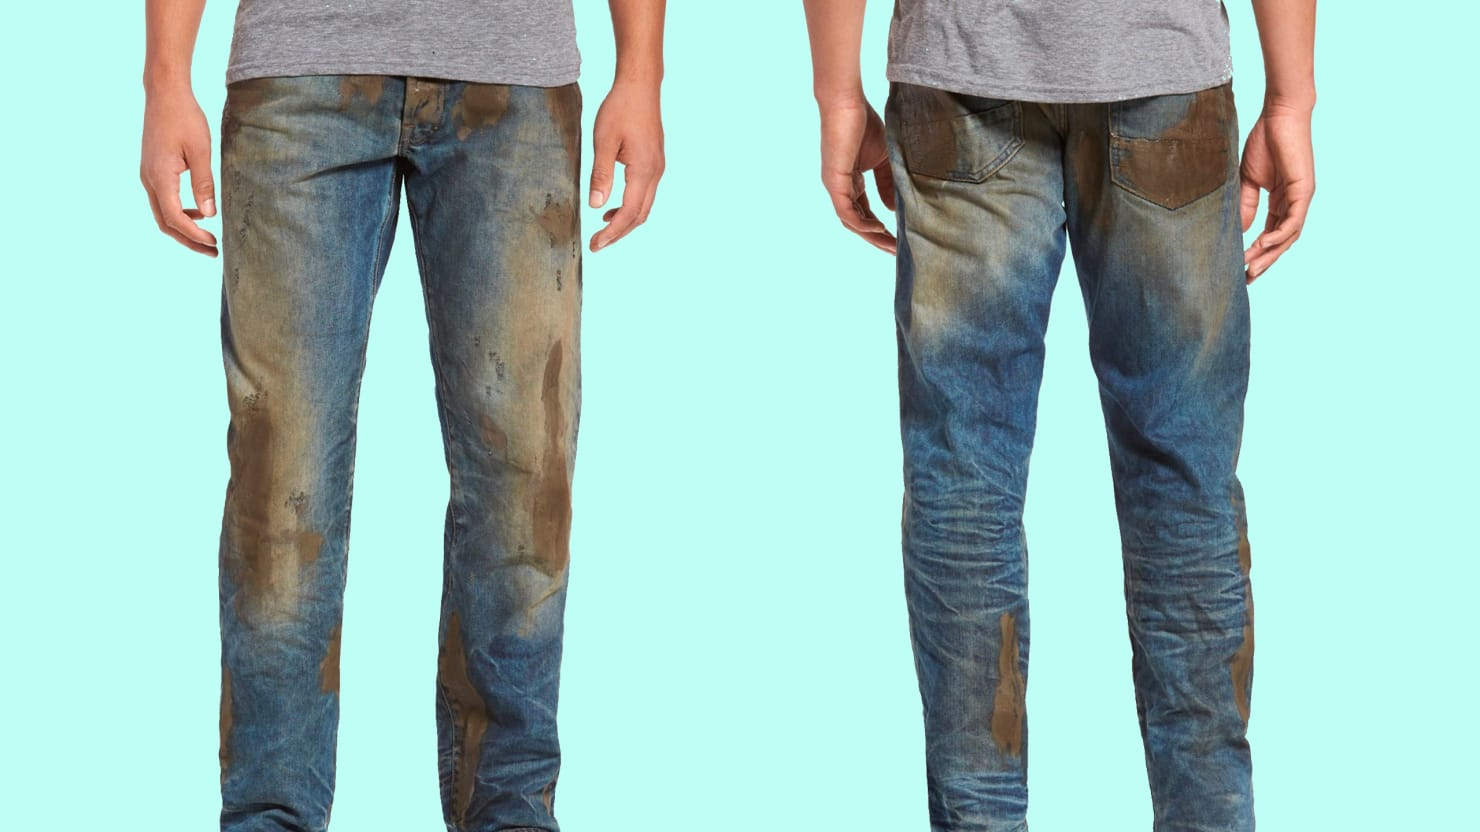 $425 Muddy Jeans Vs. DIY - YouTube